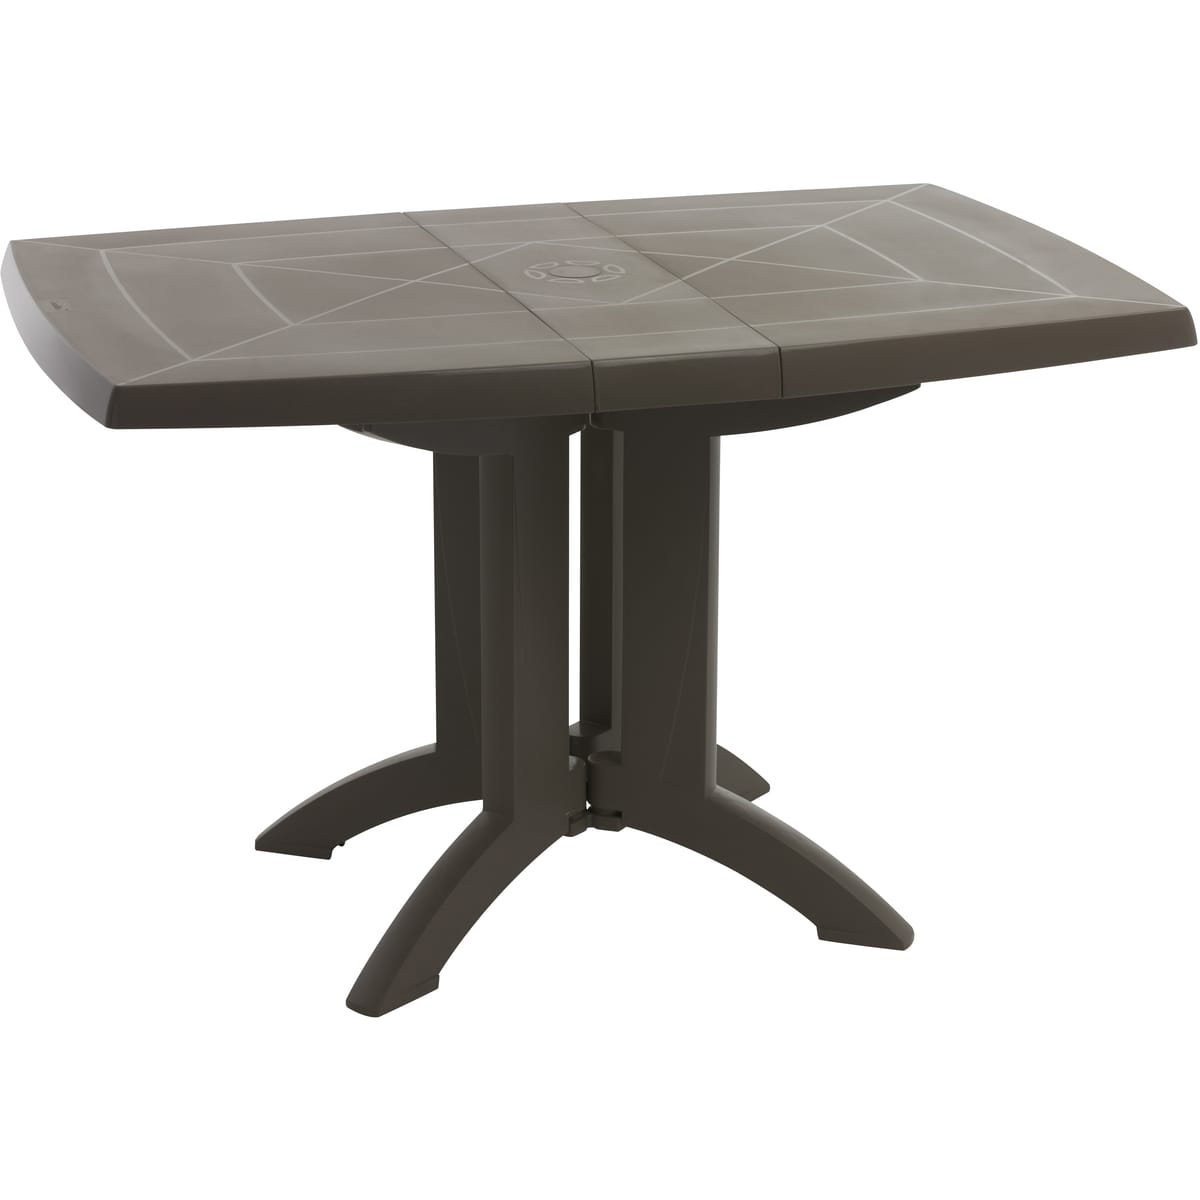 Grosfillex Table De Jardin Pliante 118X77Cm Résine Taupe Vega intérieur Table De Jardin Auchan